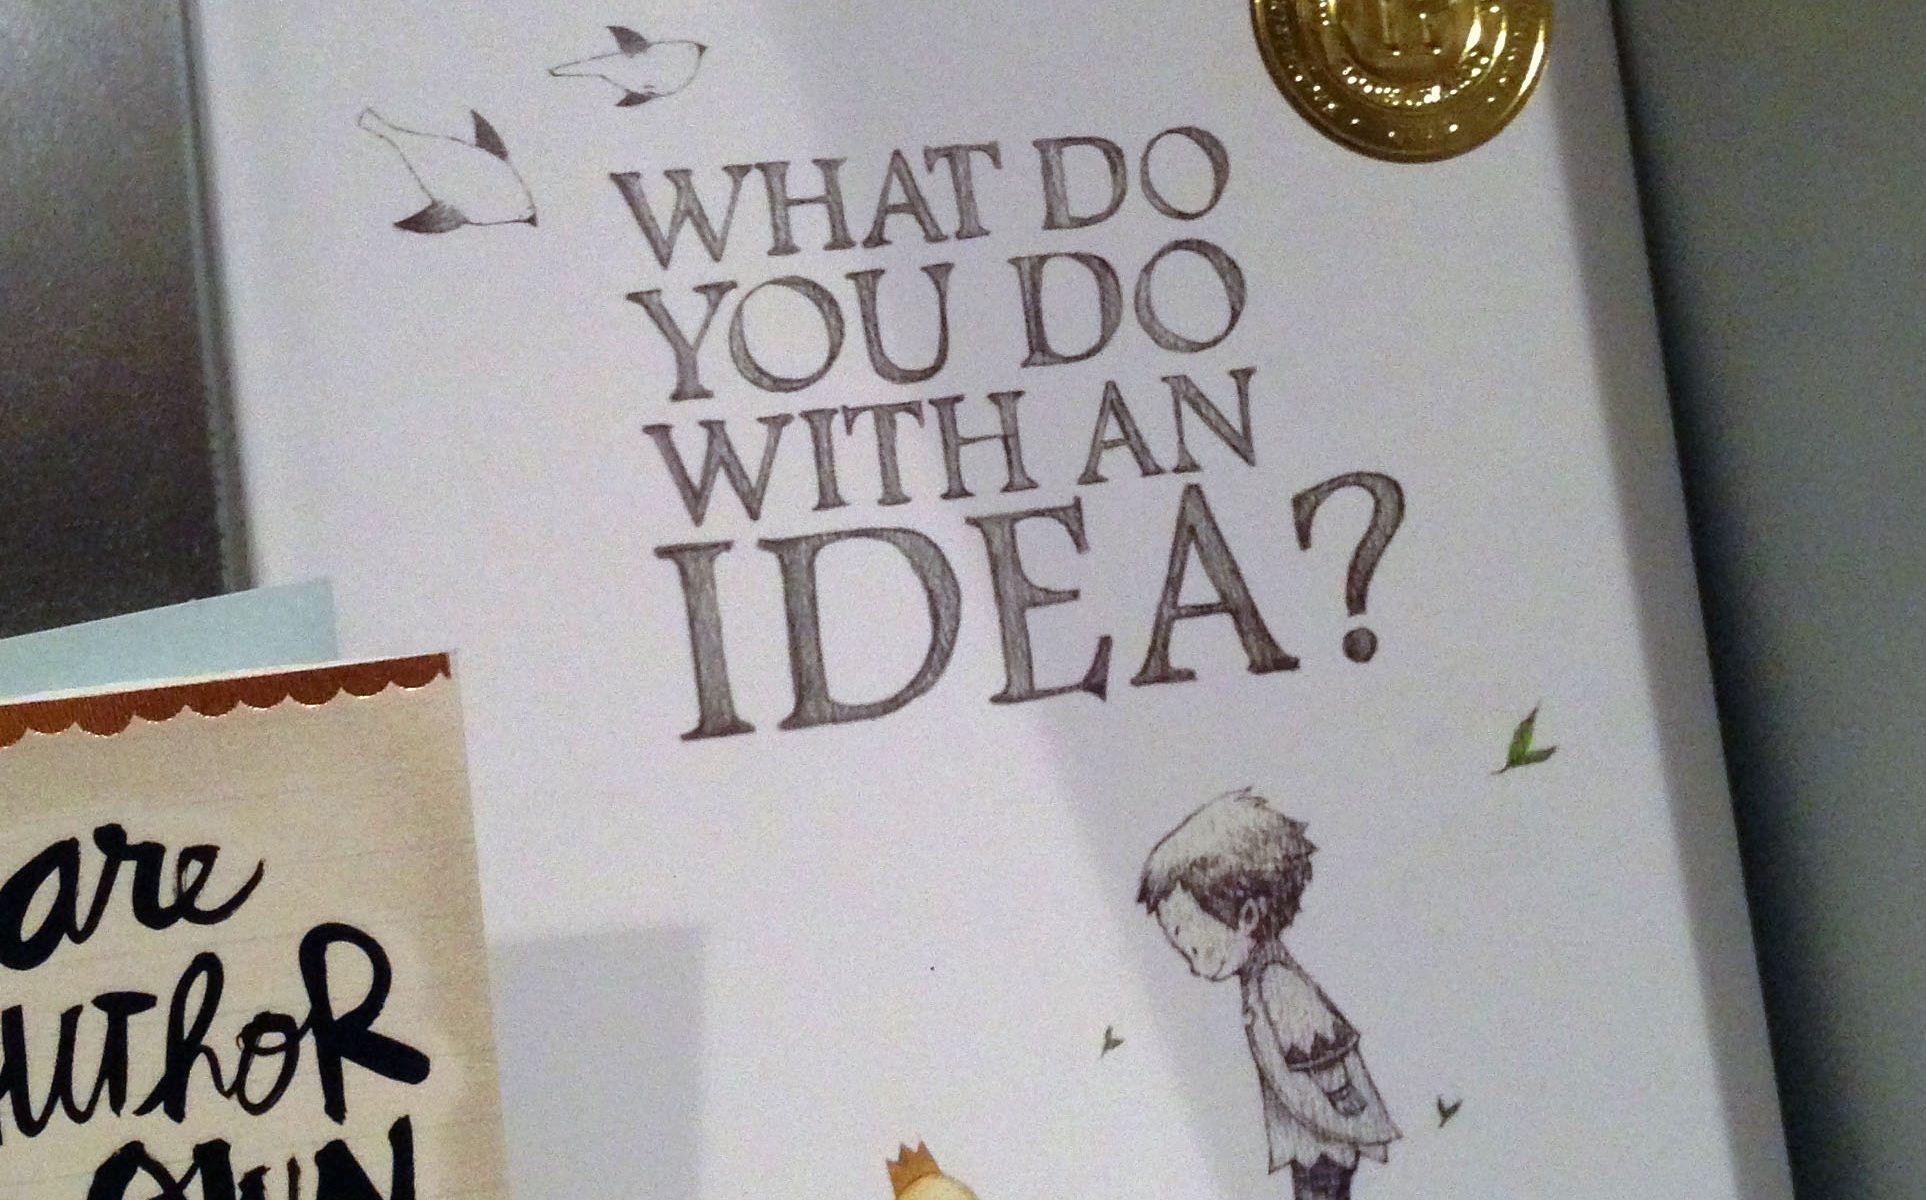 What Do You Do With An Idea by Kobi Yamada